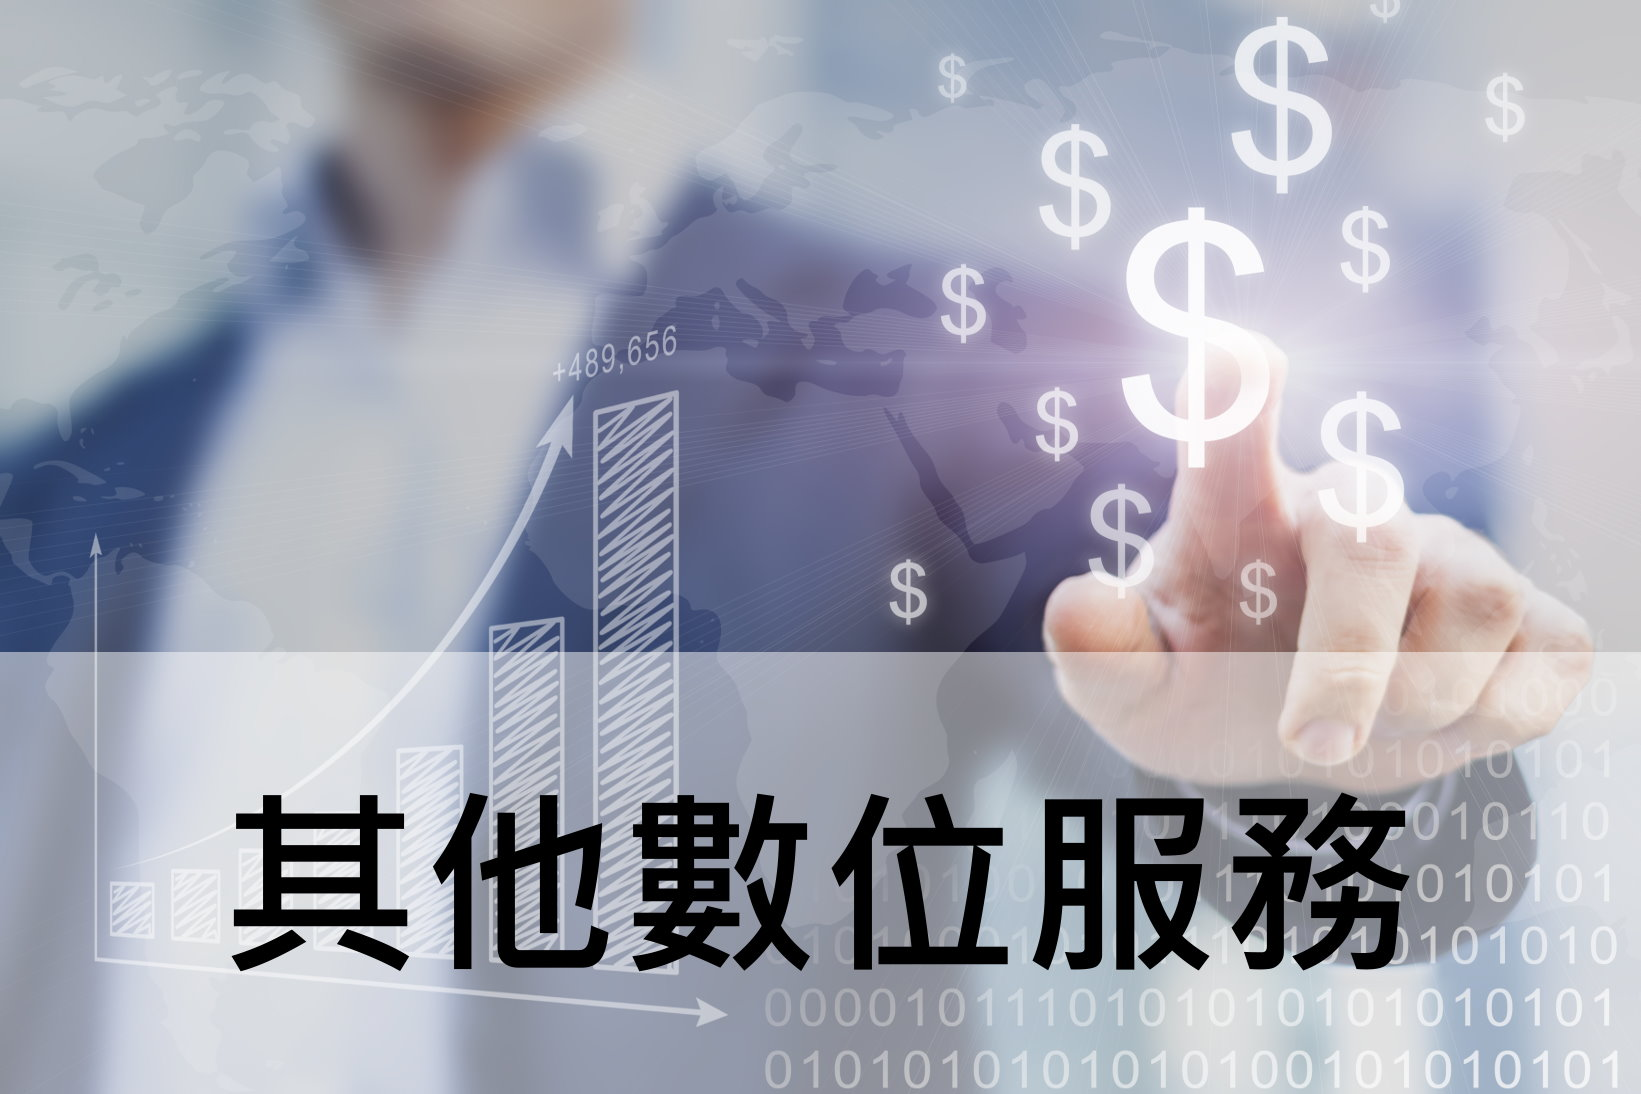 Digital Finance 08 26 03